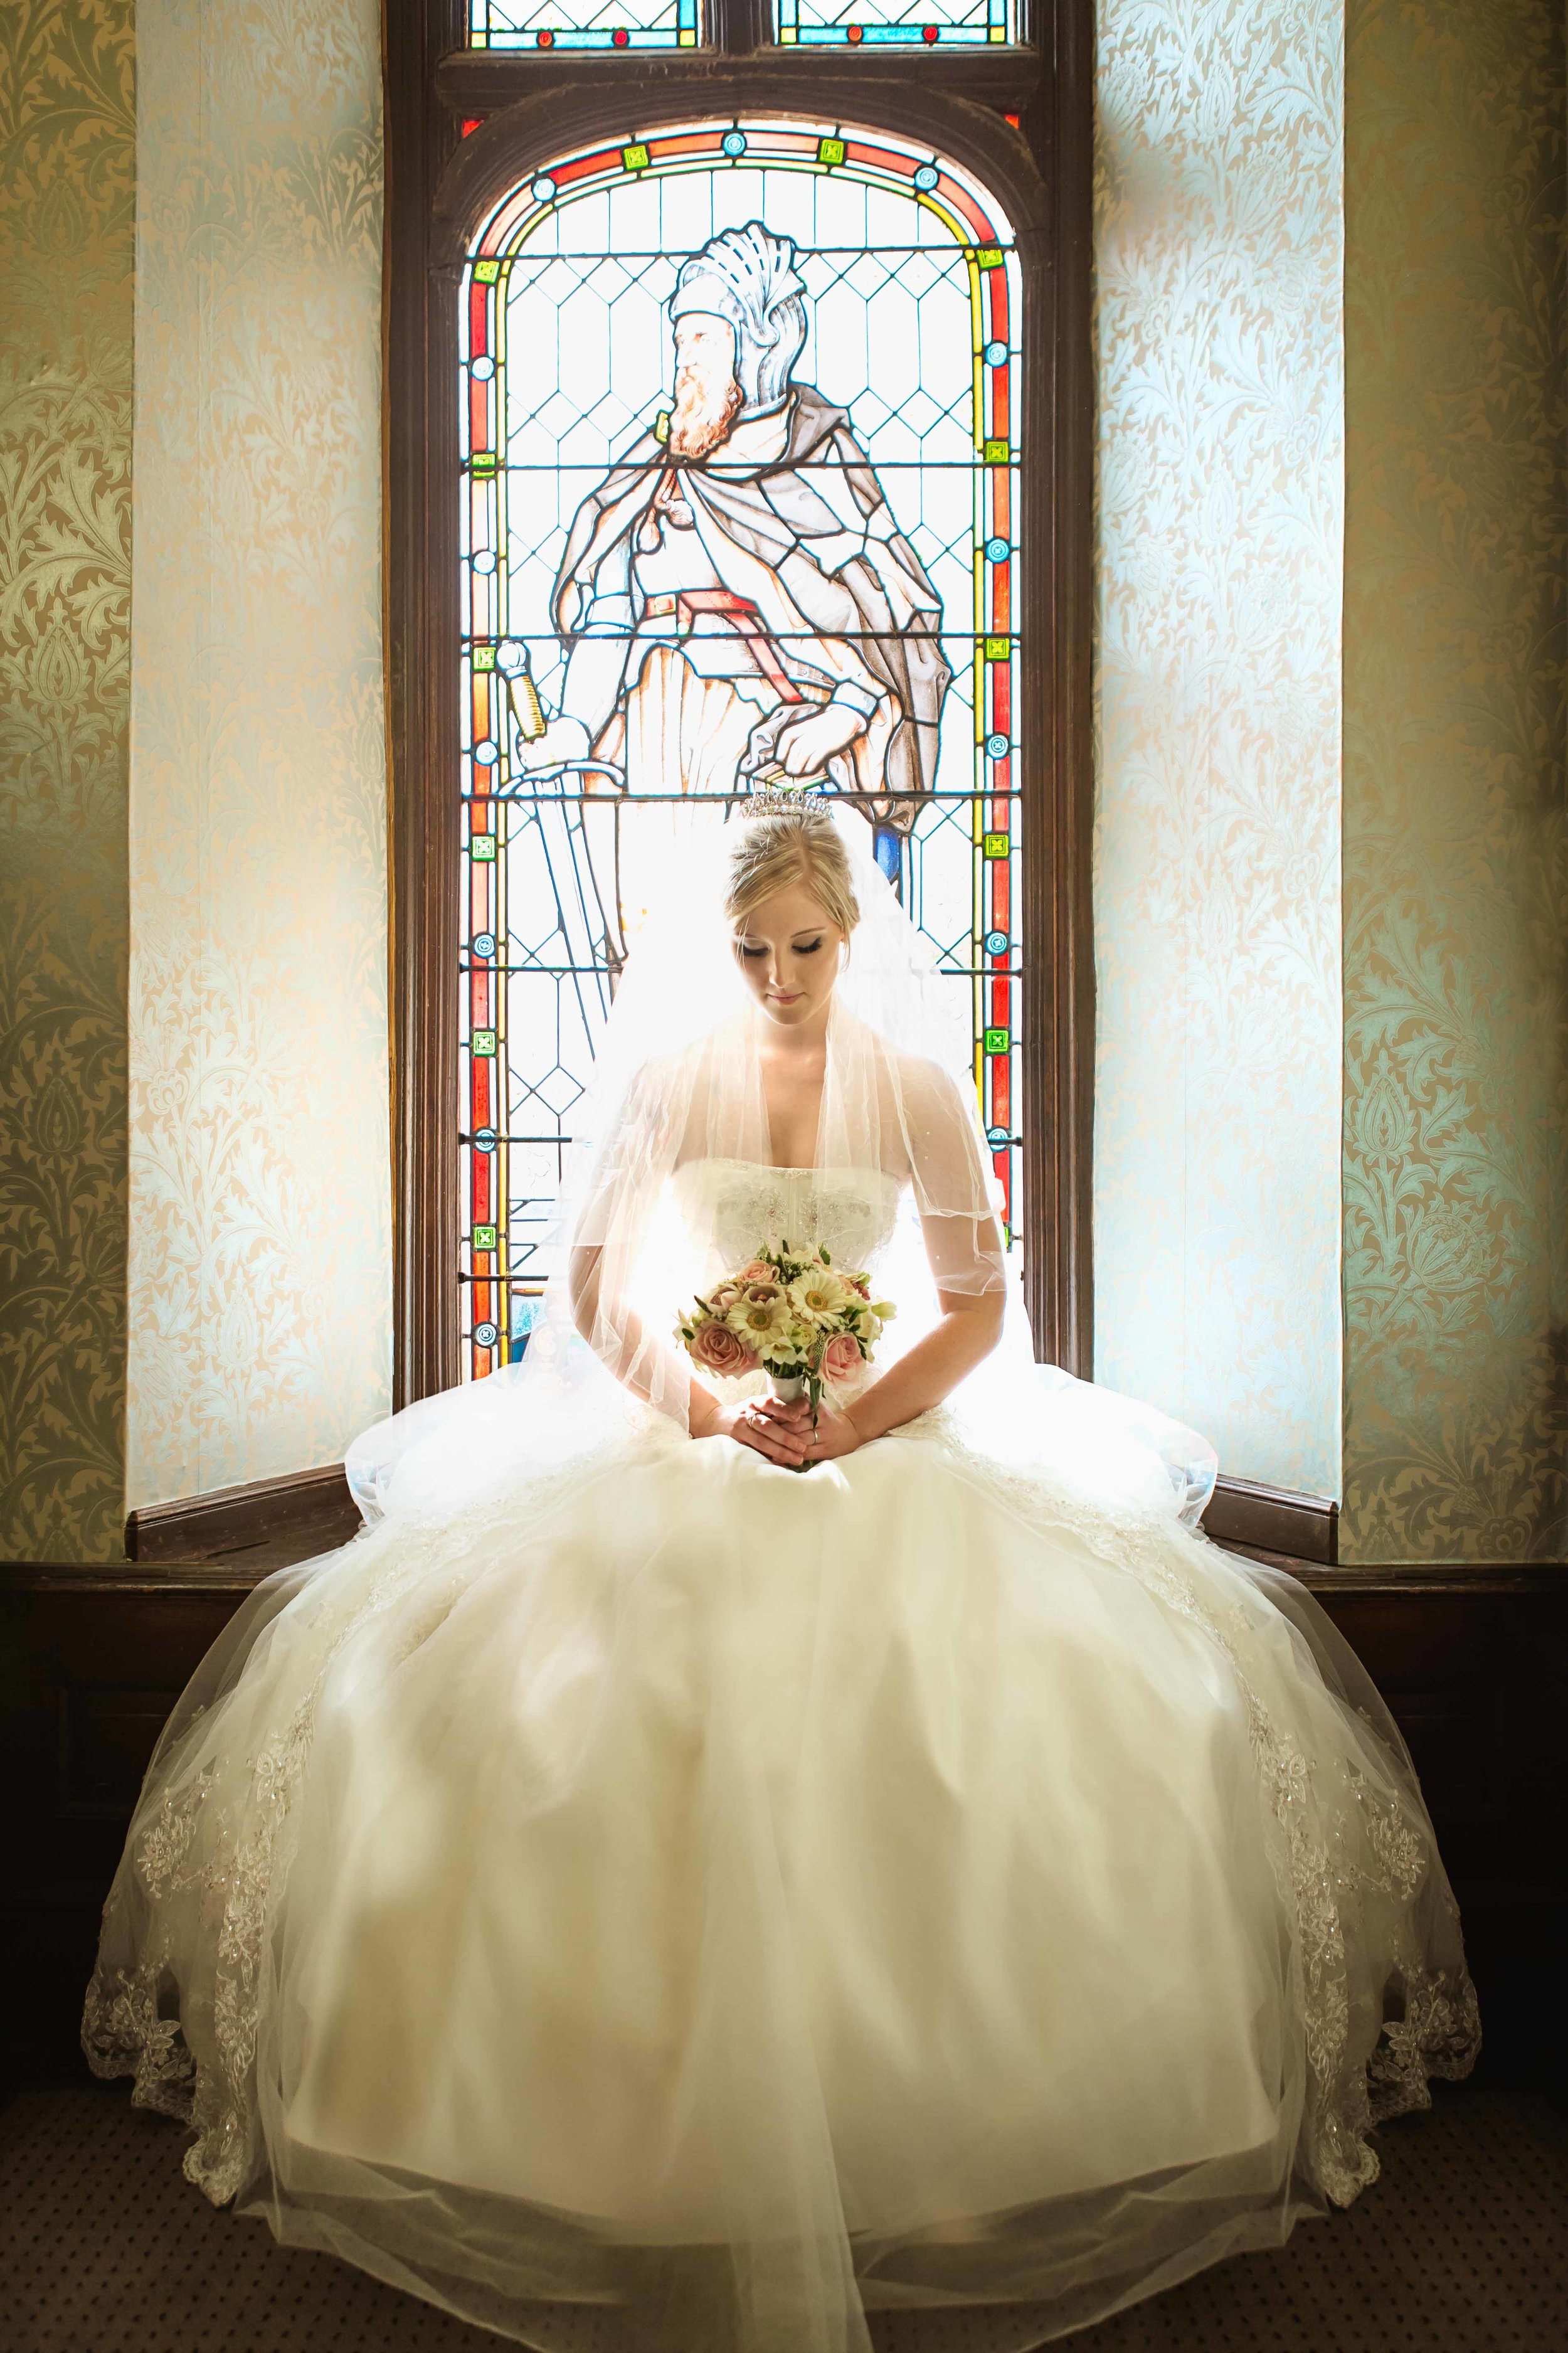 charnwood_weddings_Rothley_Court_Jess_Ali242.JPG